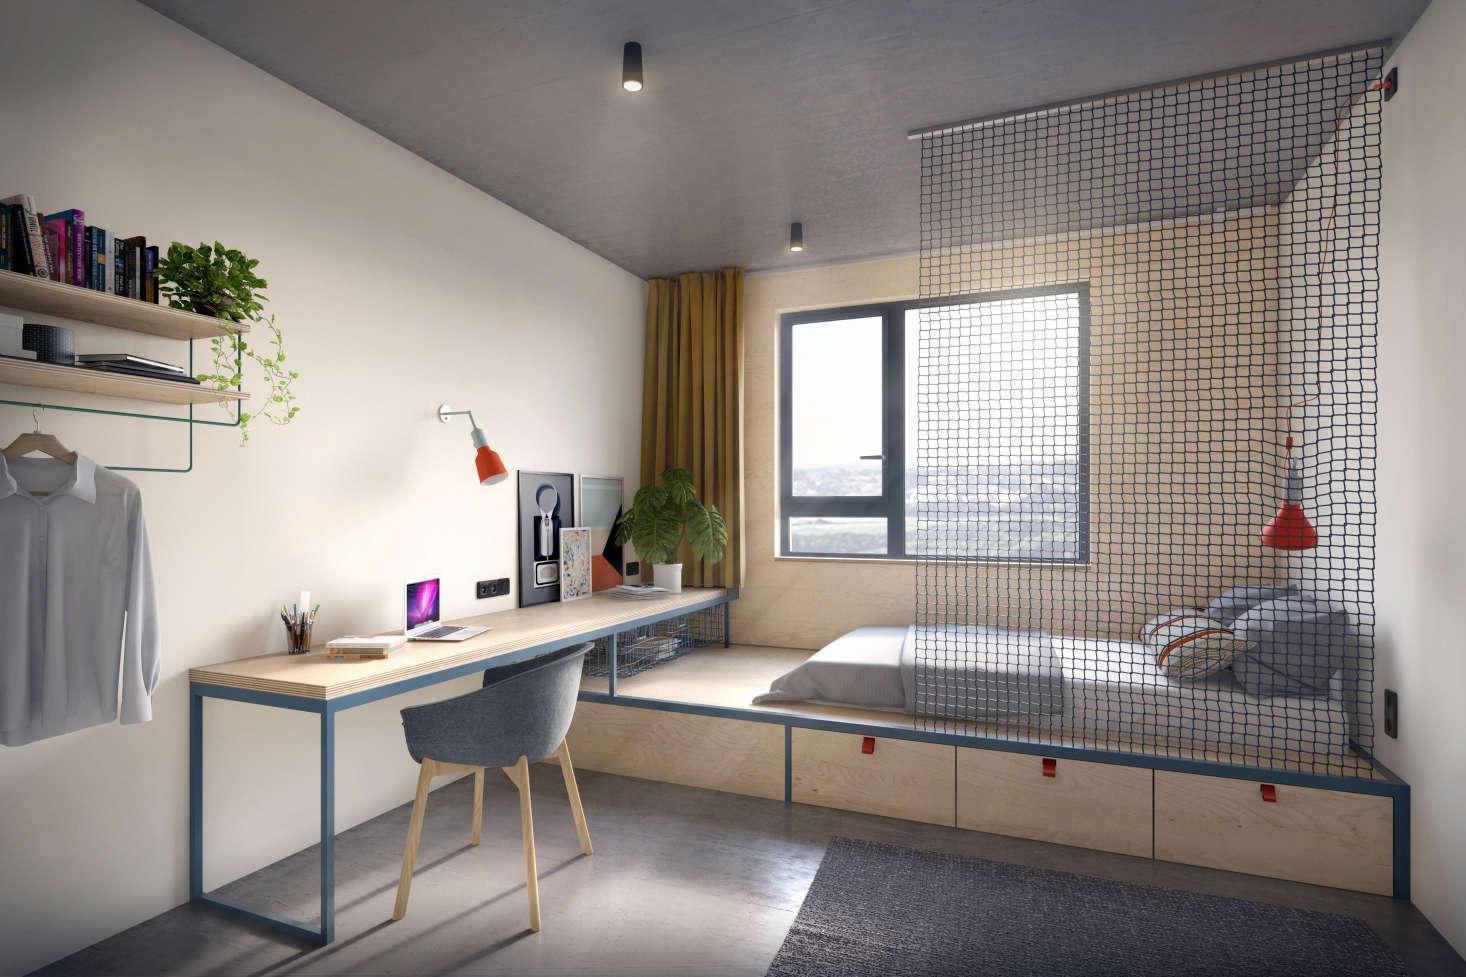 Designer dorm rooms stylish student housing and hostel